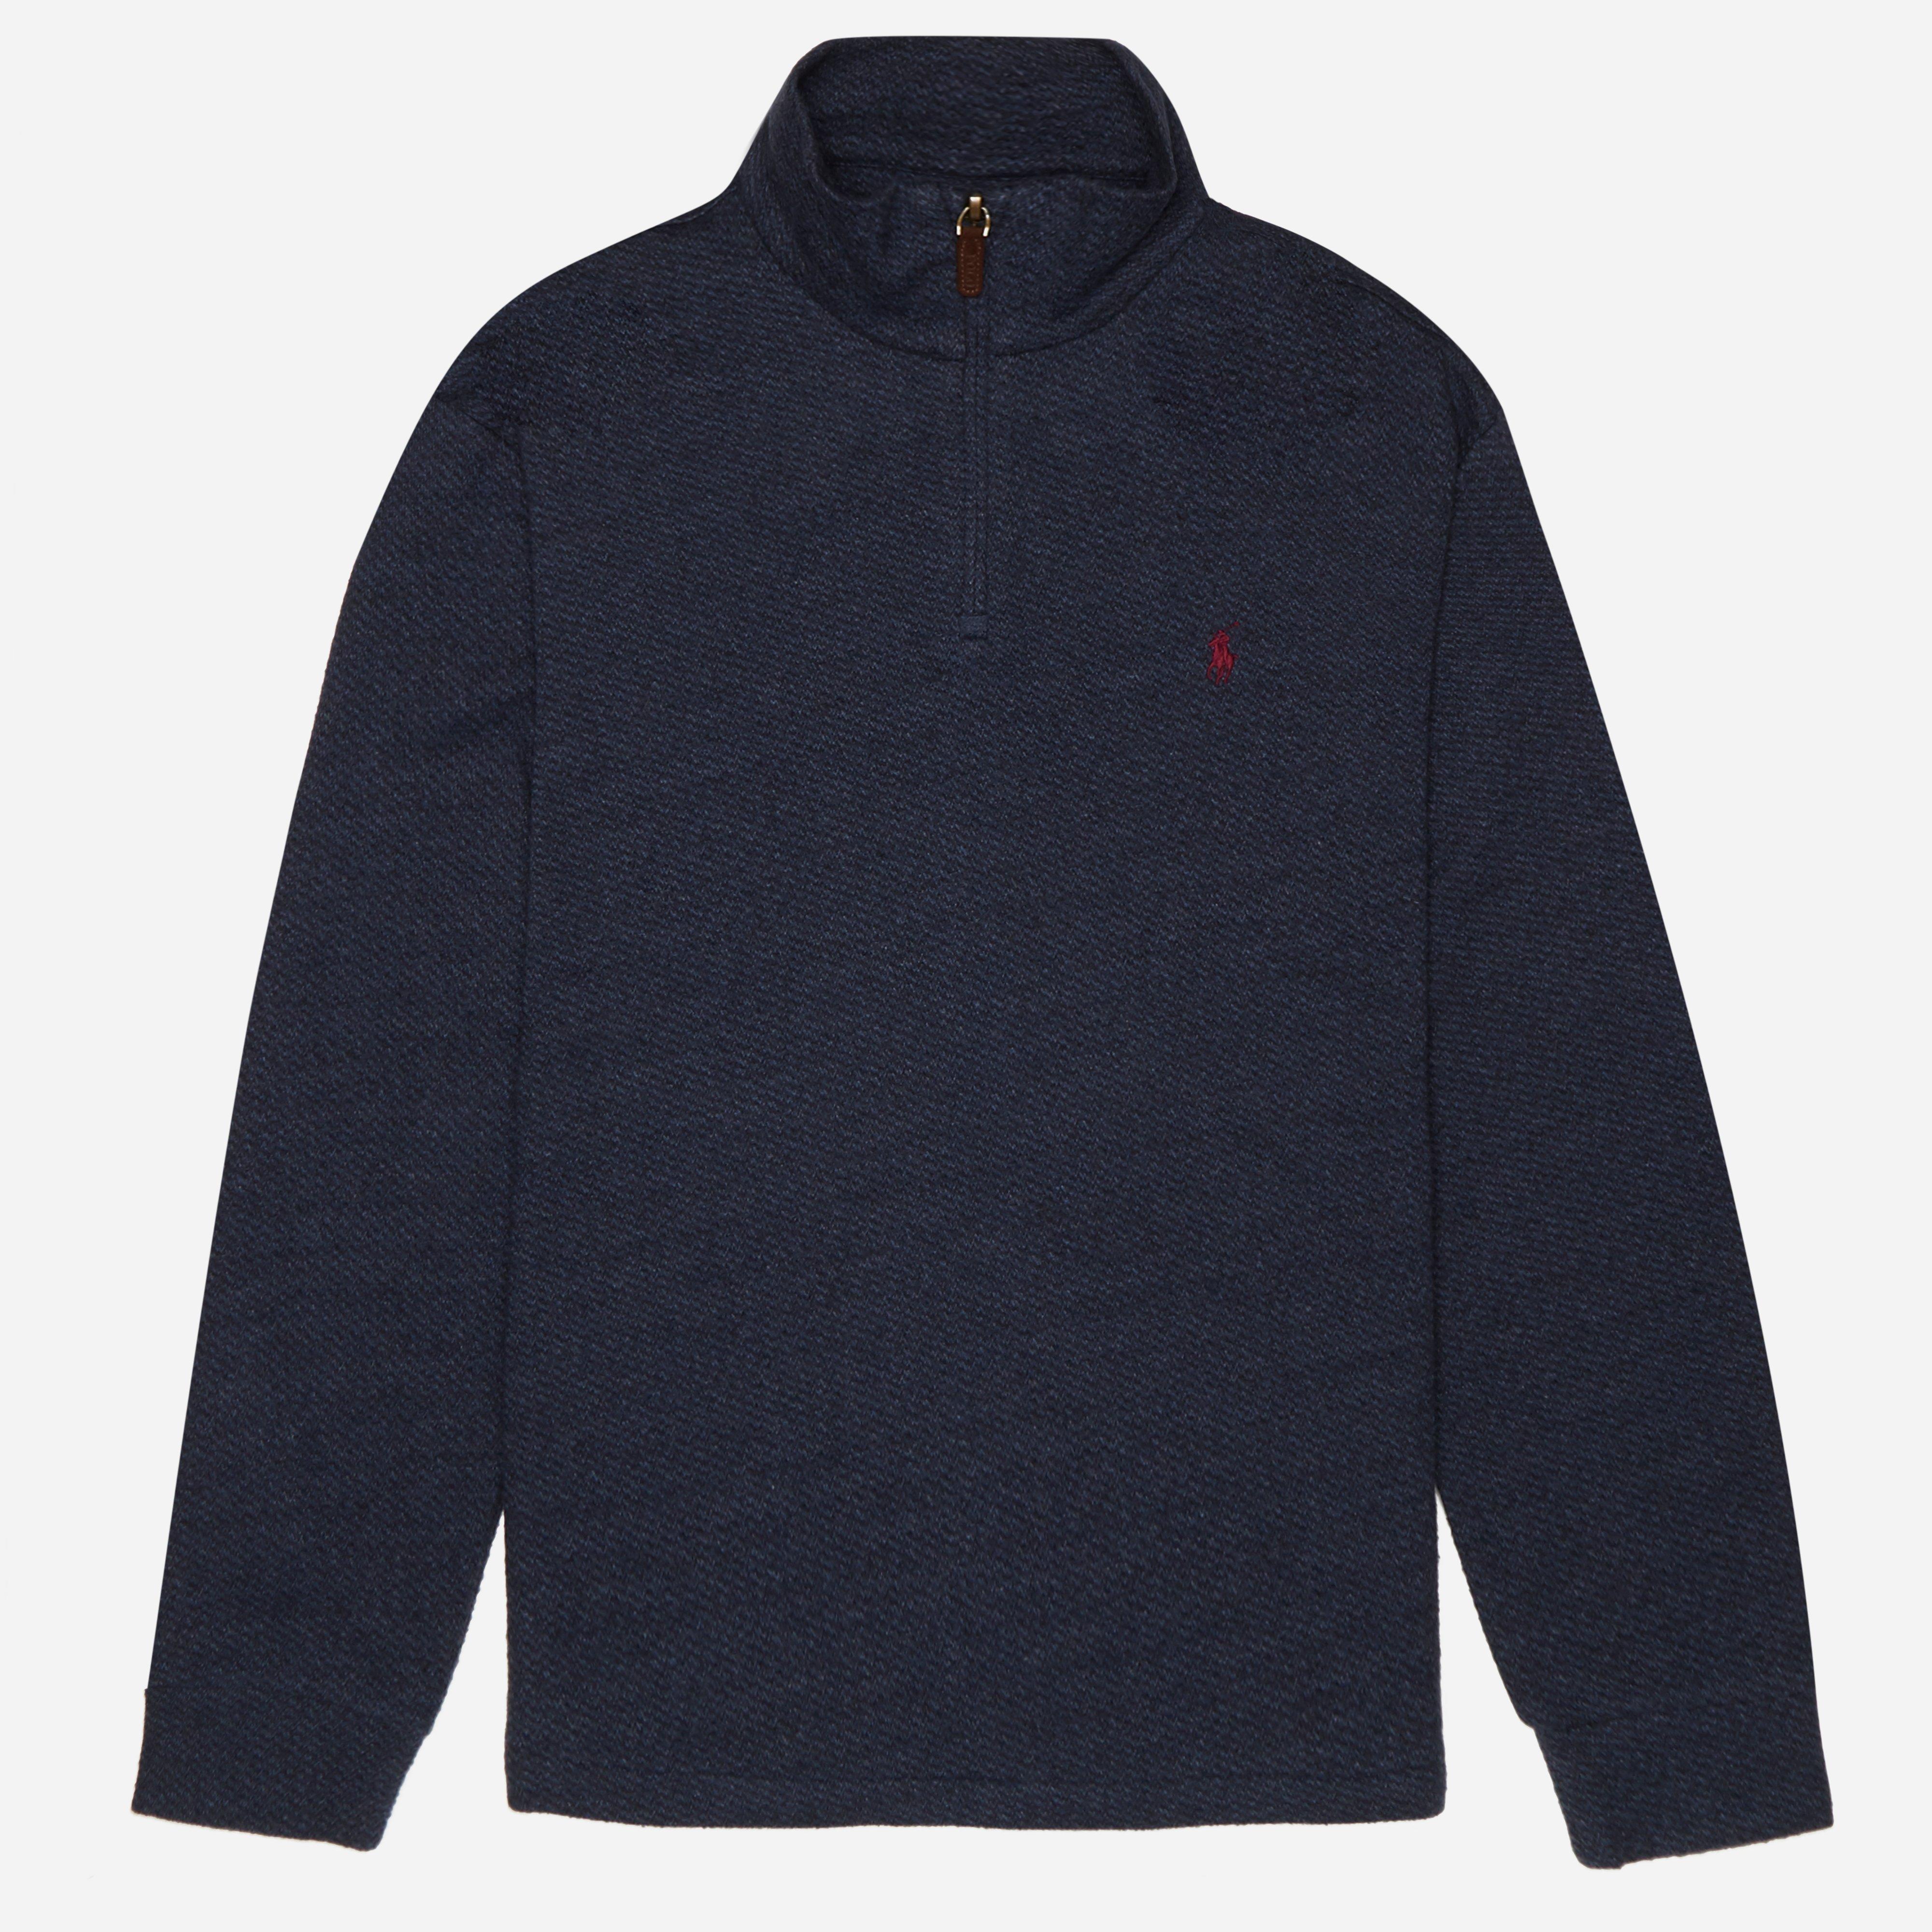 Polo Ralph Lauren Jacquard Fleece